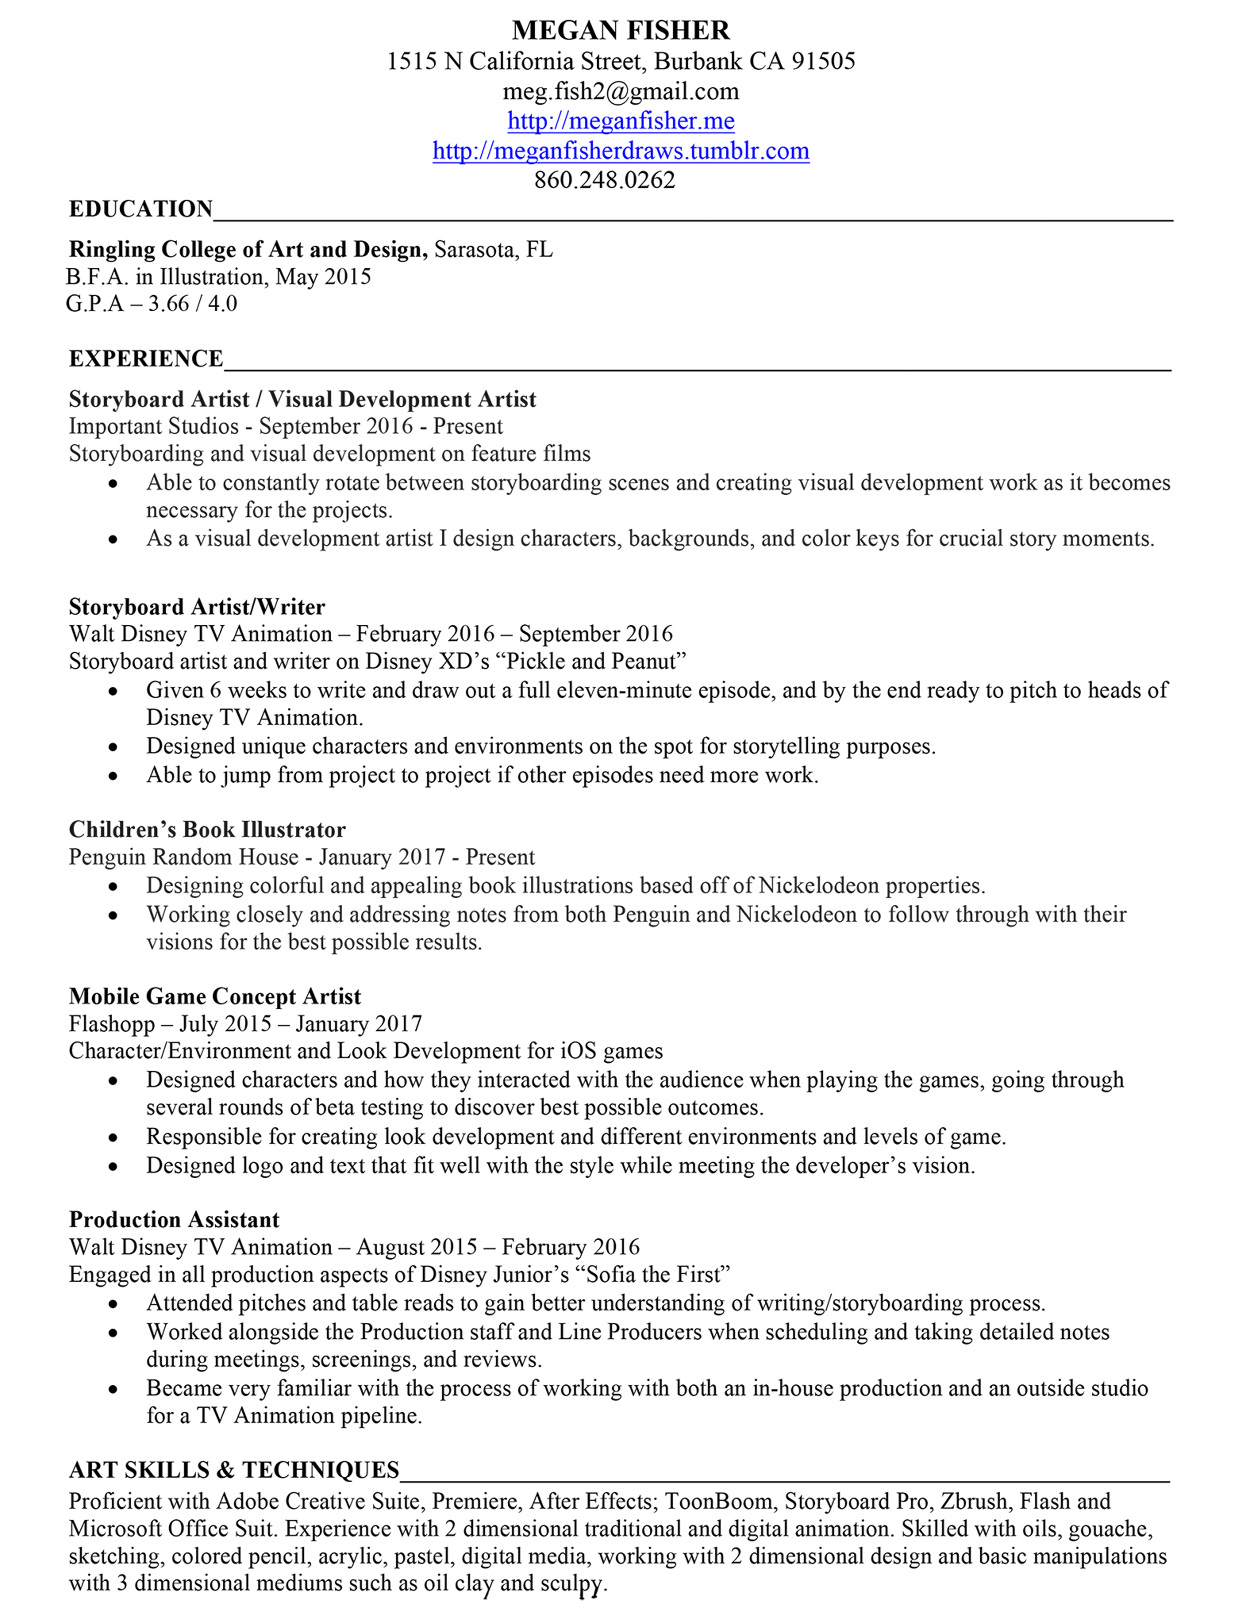 Disney College Program Resume Jaime Krzos Project Manager Homer 01 Jpg  Disney College Program Resume